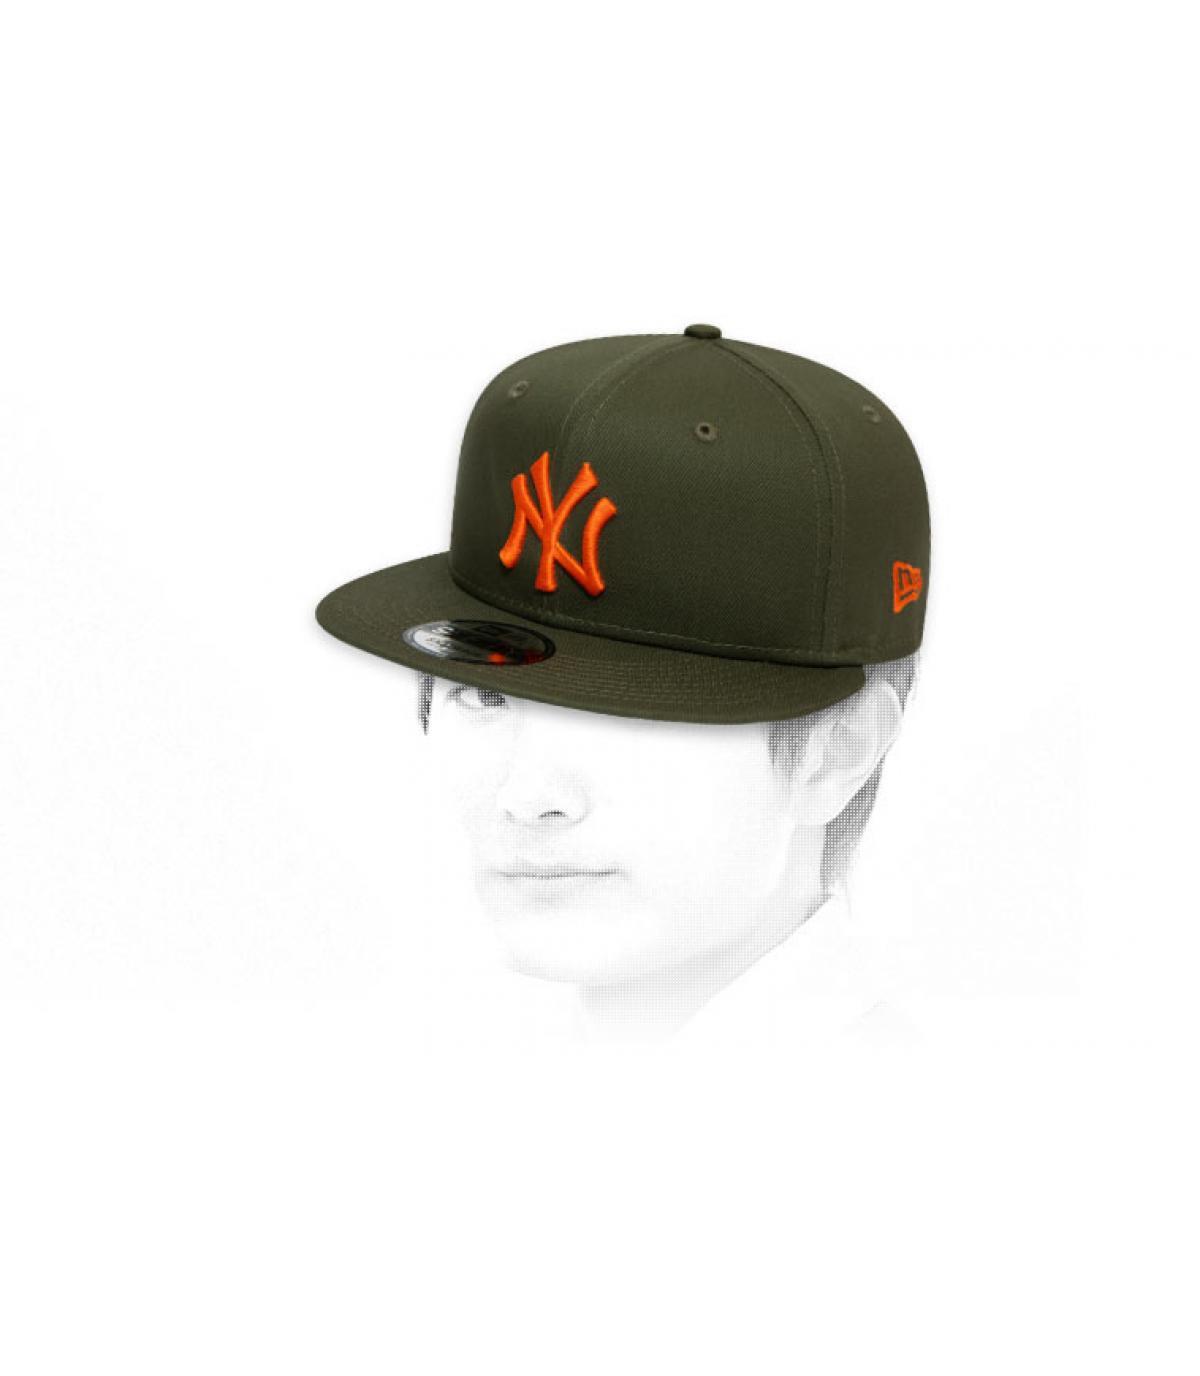 khaki orange New York snapback